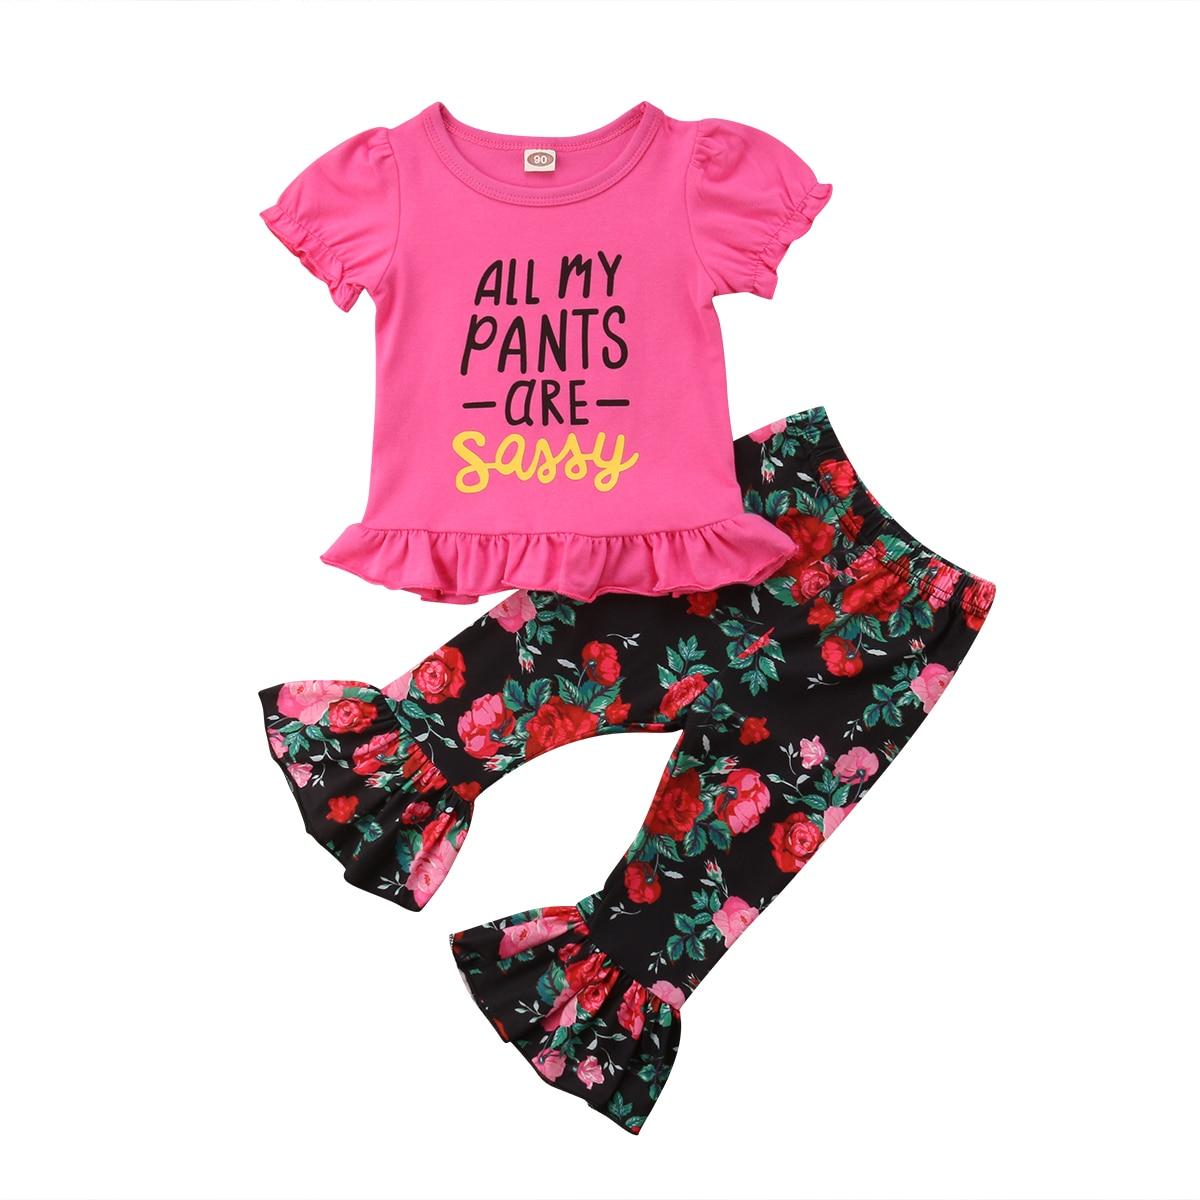 Toddler Kids Baby Girl Sassy Tops T-Shirt Short Pants Outfits Clothes Summer Set